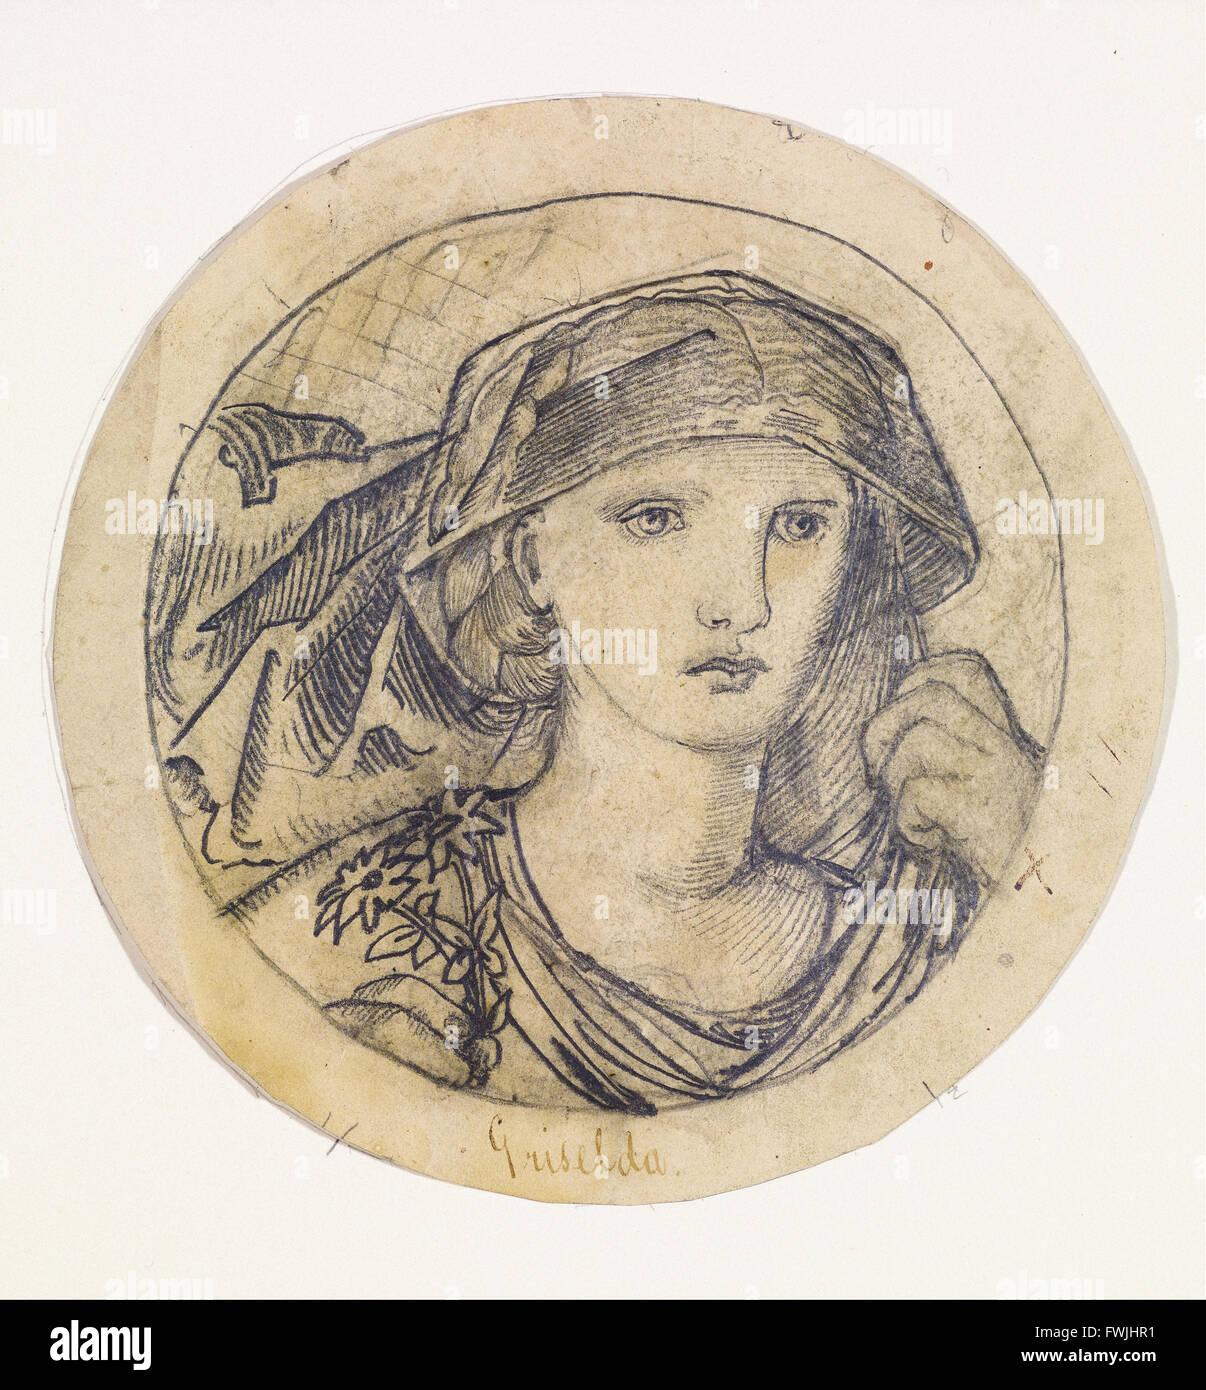 Edward Burne-Jones - Chaucer's 'Legend of Good Women' - Griselda - Birmingham Museum and Art Gallery - Stock Image